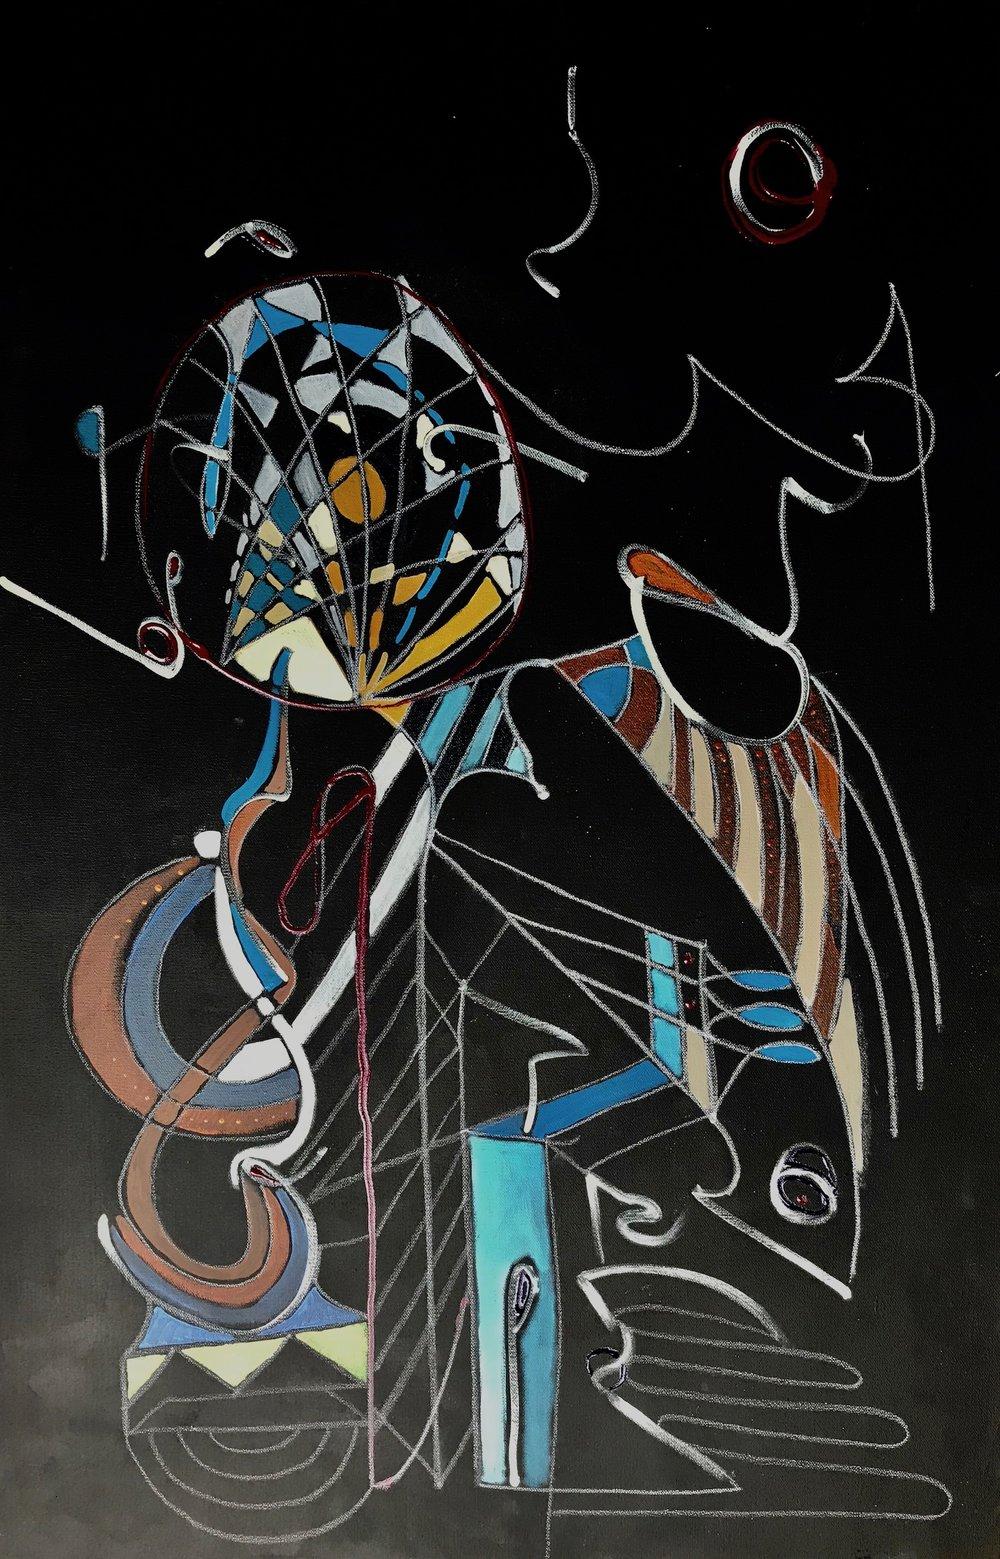 Cirque by Jane Mayer